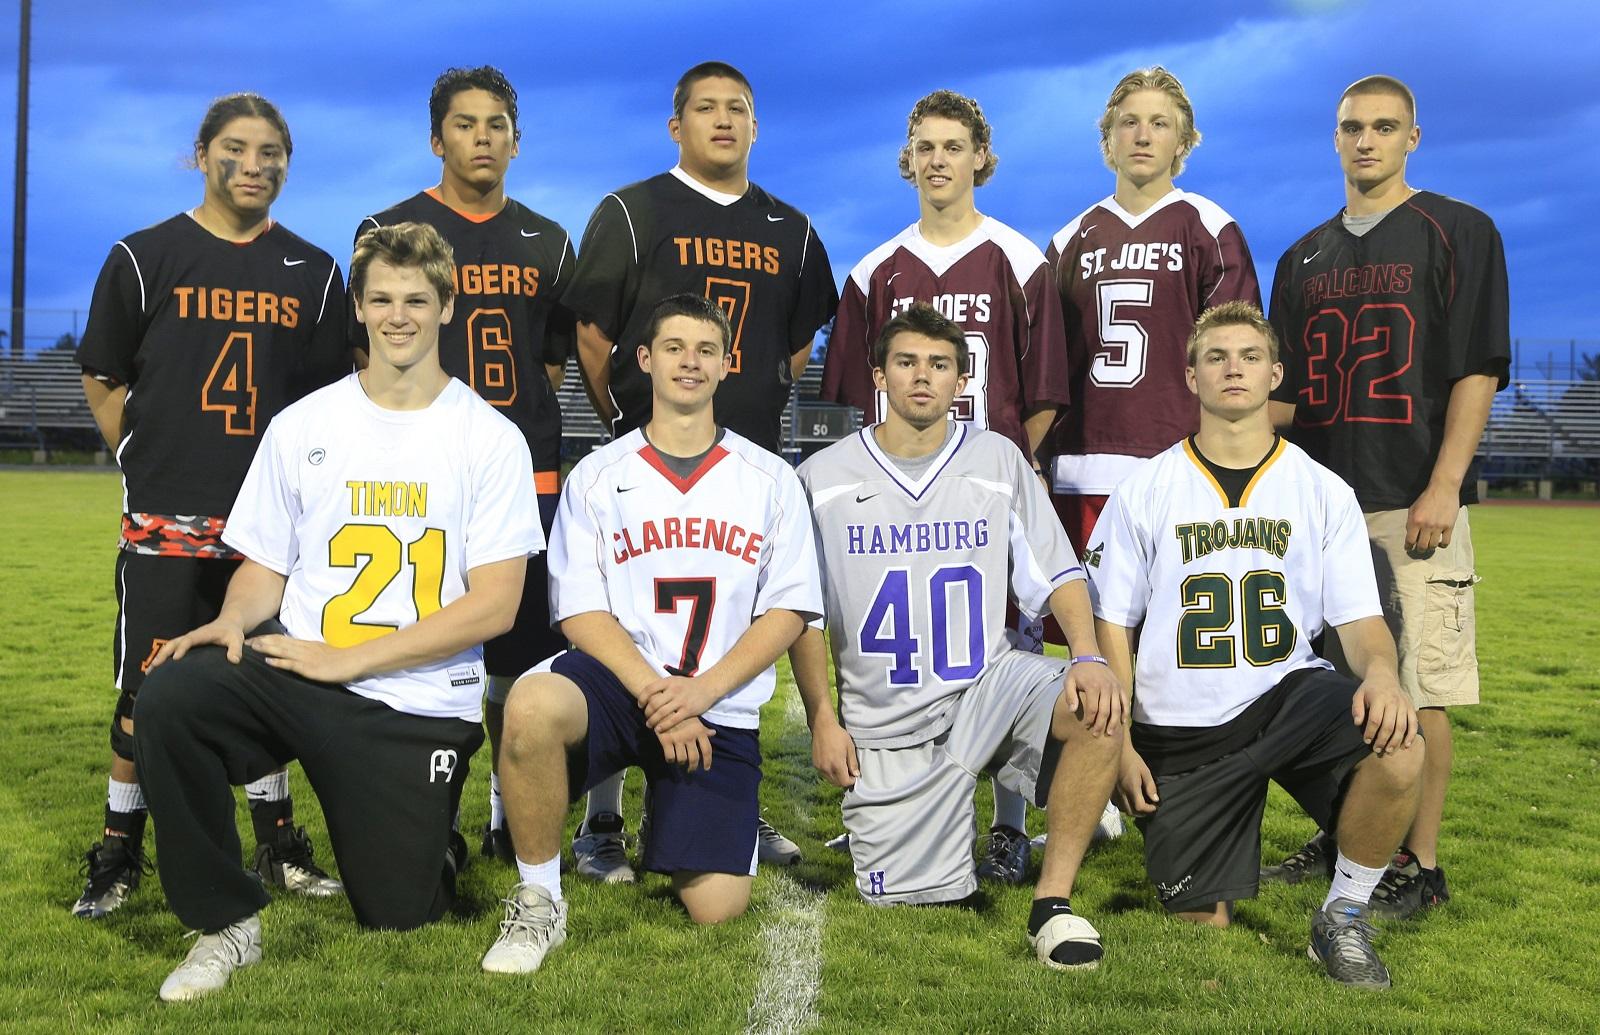 All-WNY Boys lacrosse for 2015. Front row, left to right: Tristan Dougherty (Timon), Josh Slowinski (Clarence), Evan Hollfelder (Hamburg), Tyler Skretny (West Seneca East) Back row, left to right: Chaunce Hill (Akron), Larson Sundown (Akron), Gates Abrams (Akron),Myles Young (St.Joe's), Peter Masters (St. Joe's), James Stenzel  (Niagara-Wheatfield). (Harry Scull Jr./Buffalo News)